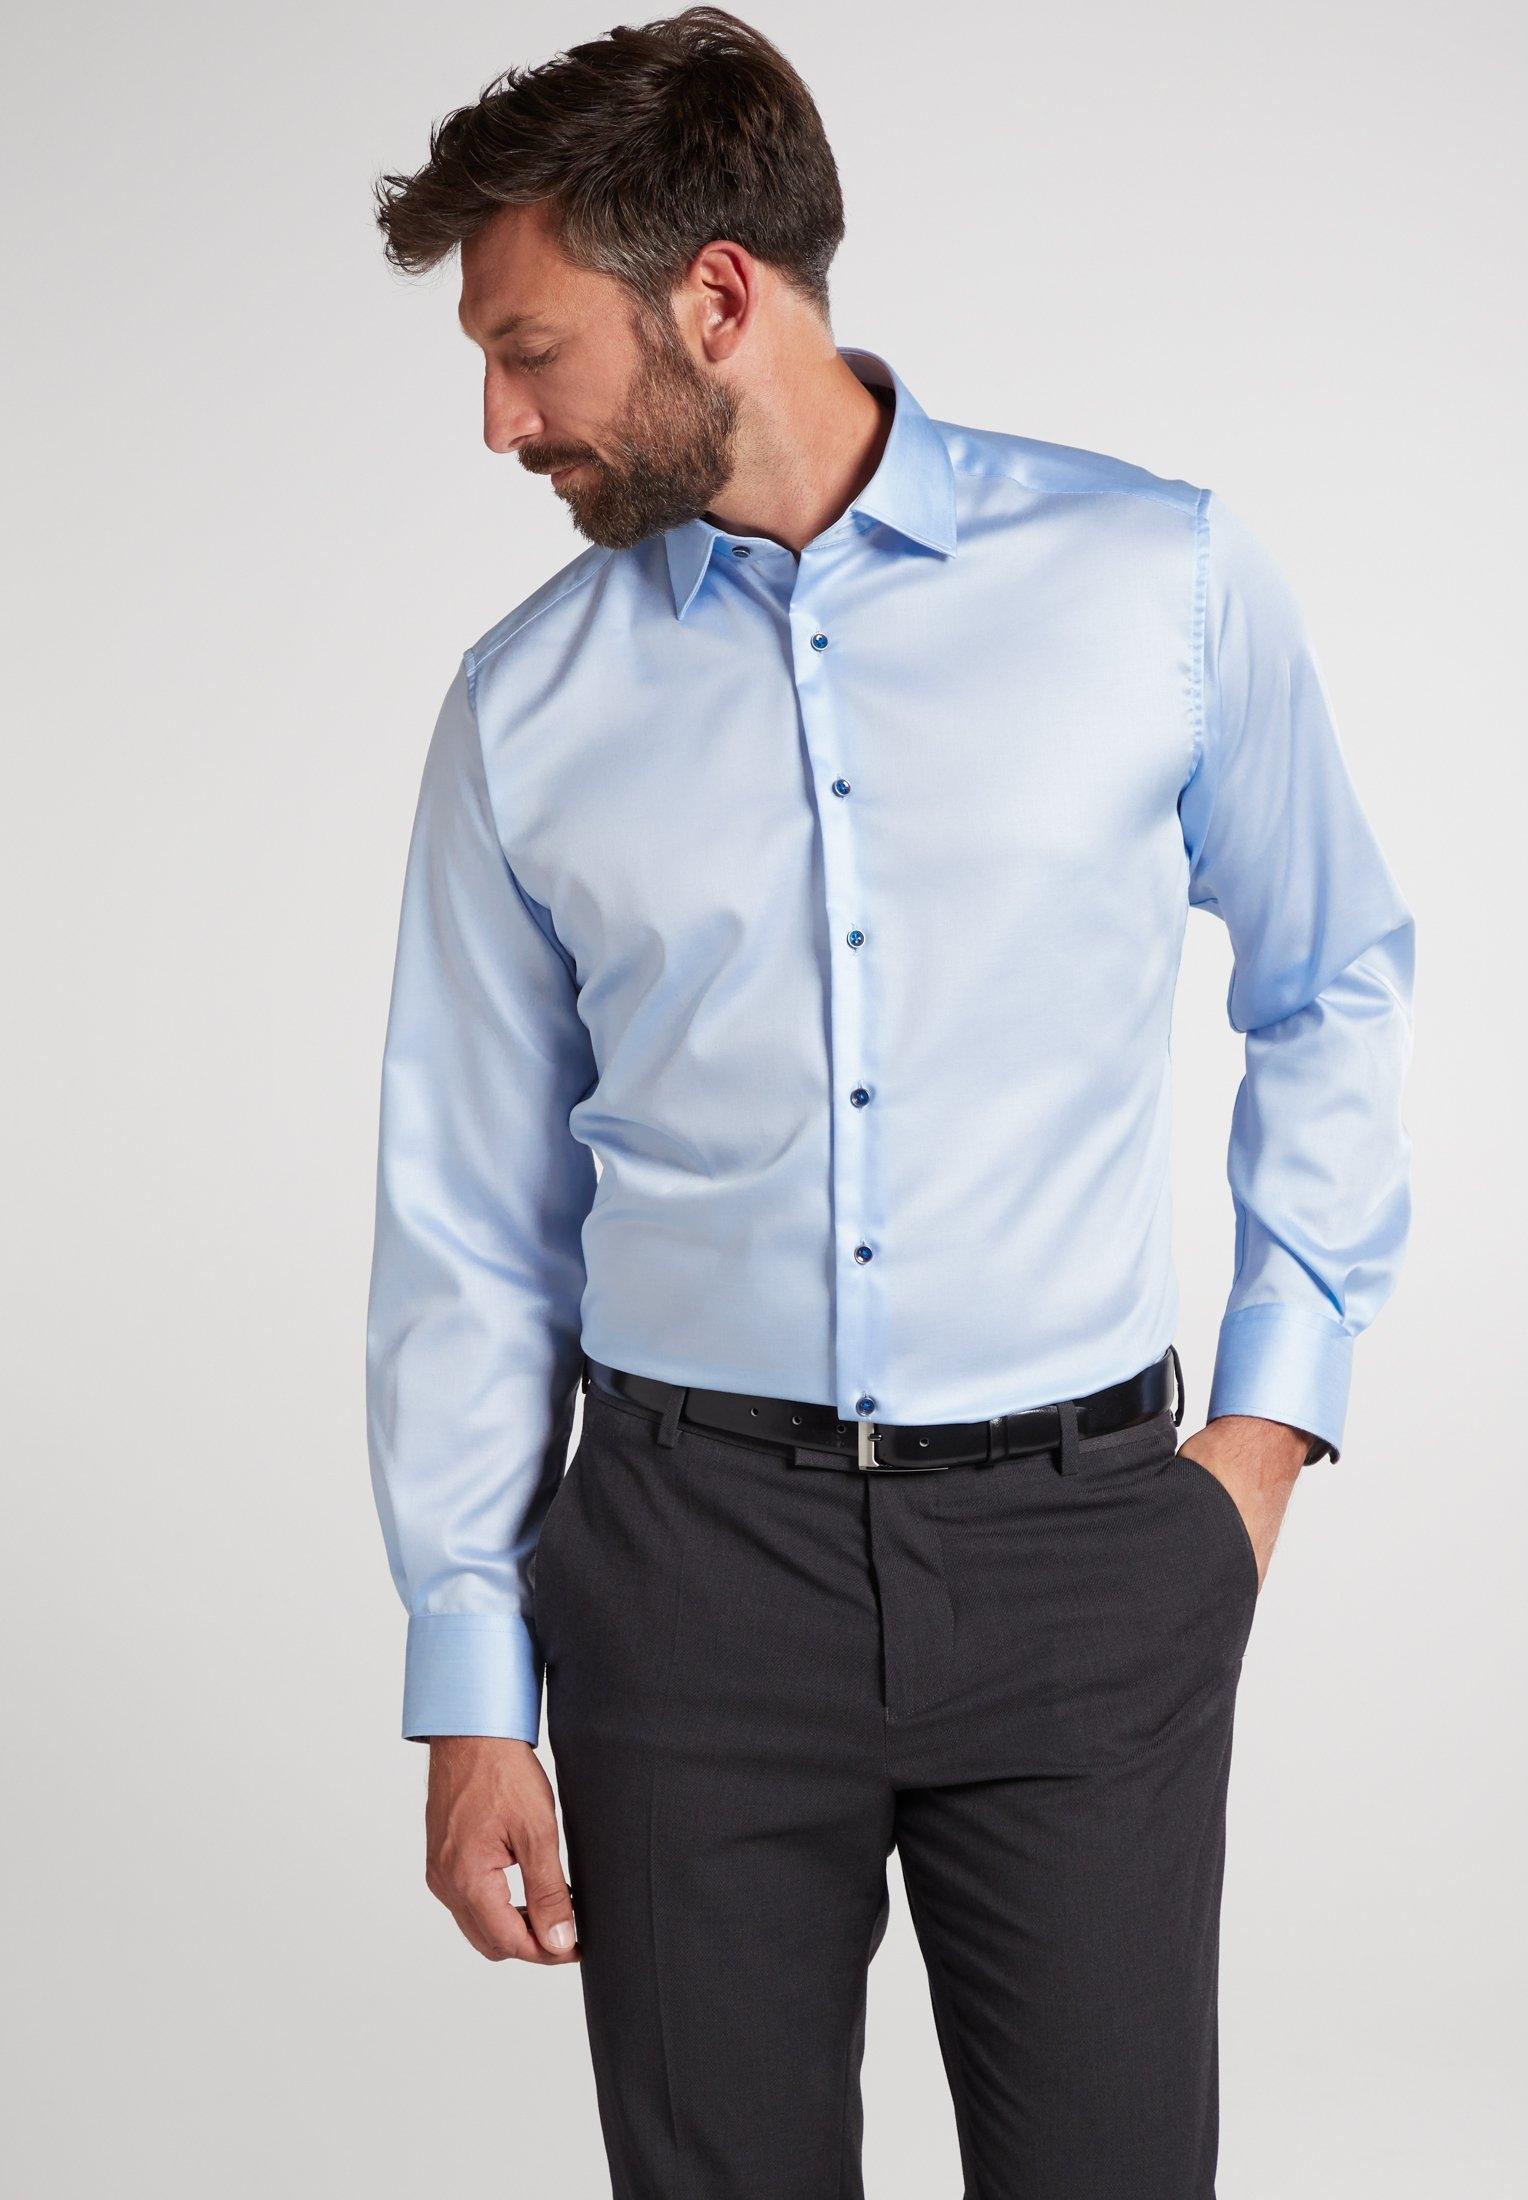 Eterna businessoverhemd MODERN FIT Lange mouwen voordelig en veilig online kopen